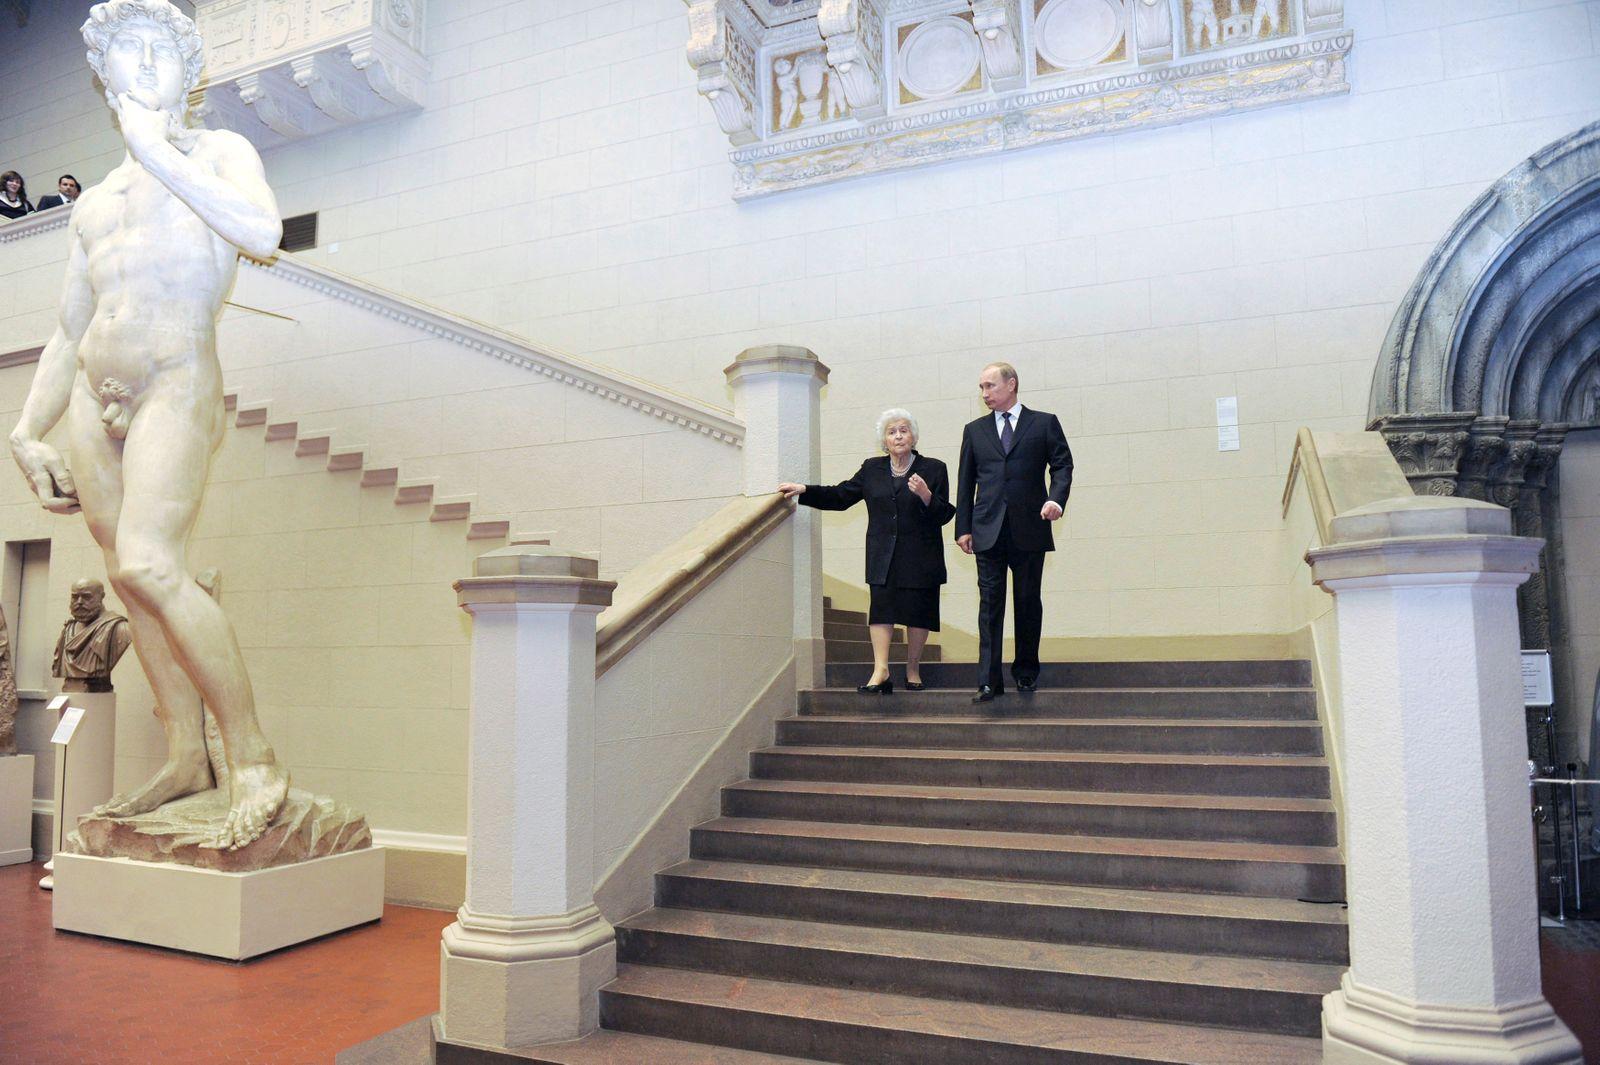 Russia's Prime Minister Putin, accompanied by Director of the Pushkin Museum of Fine Arts Irina Antonova, visits an exhibition of Italian artist Michelangelo De Caravaggio in Moscow